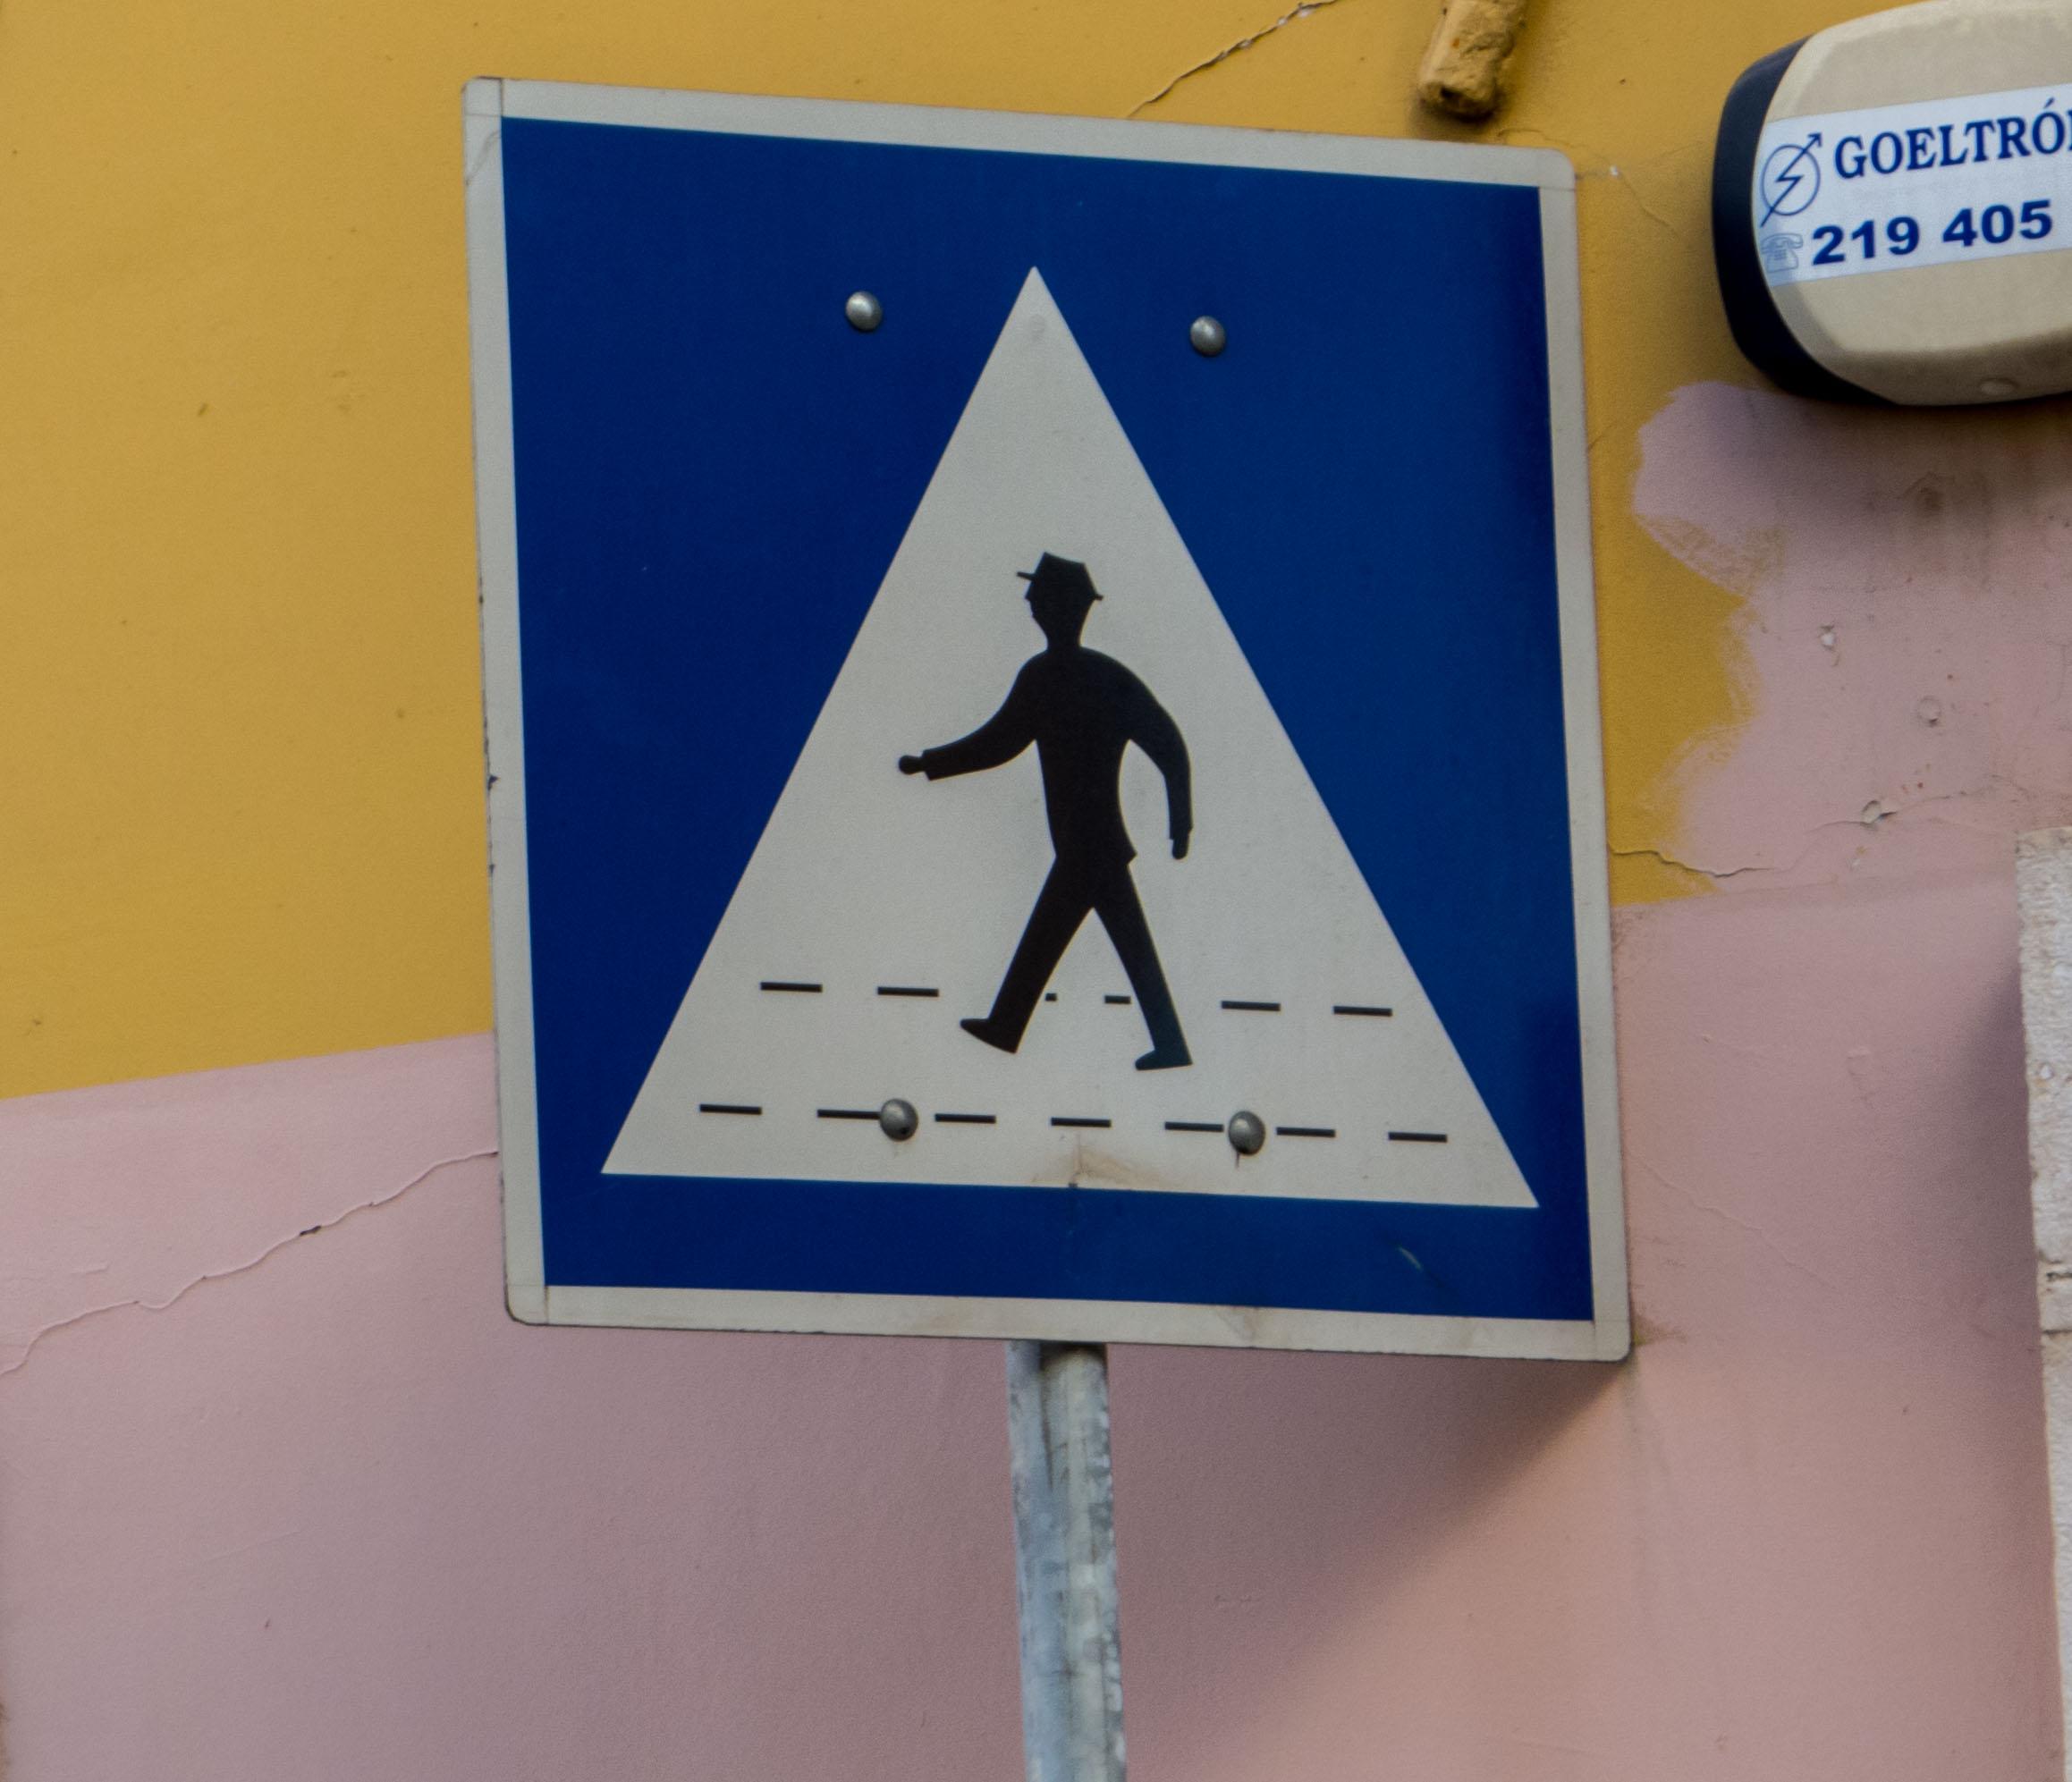 Stylized crosswalk, stop, sign, traffic, walk, HQ Photo